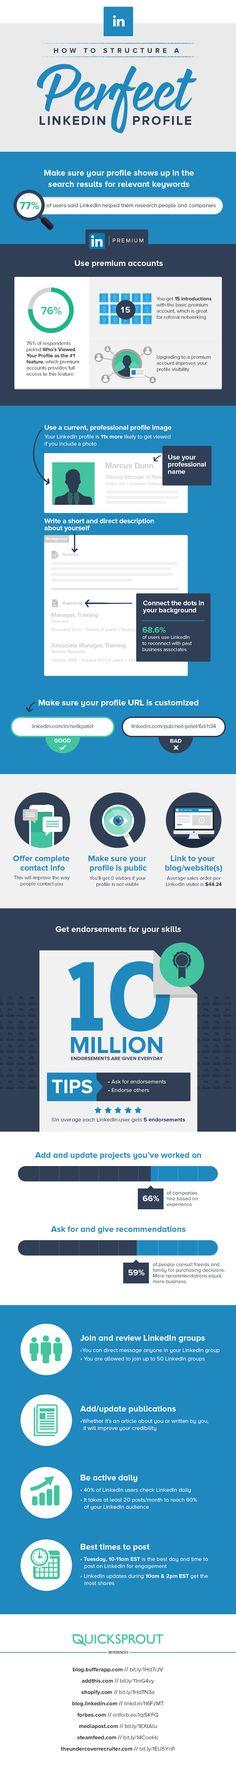 203 best LINKEDIN images on Pinterest Social media marketing - best of blueprint software systems linkedin